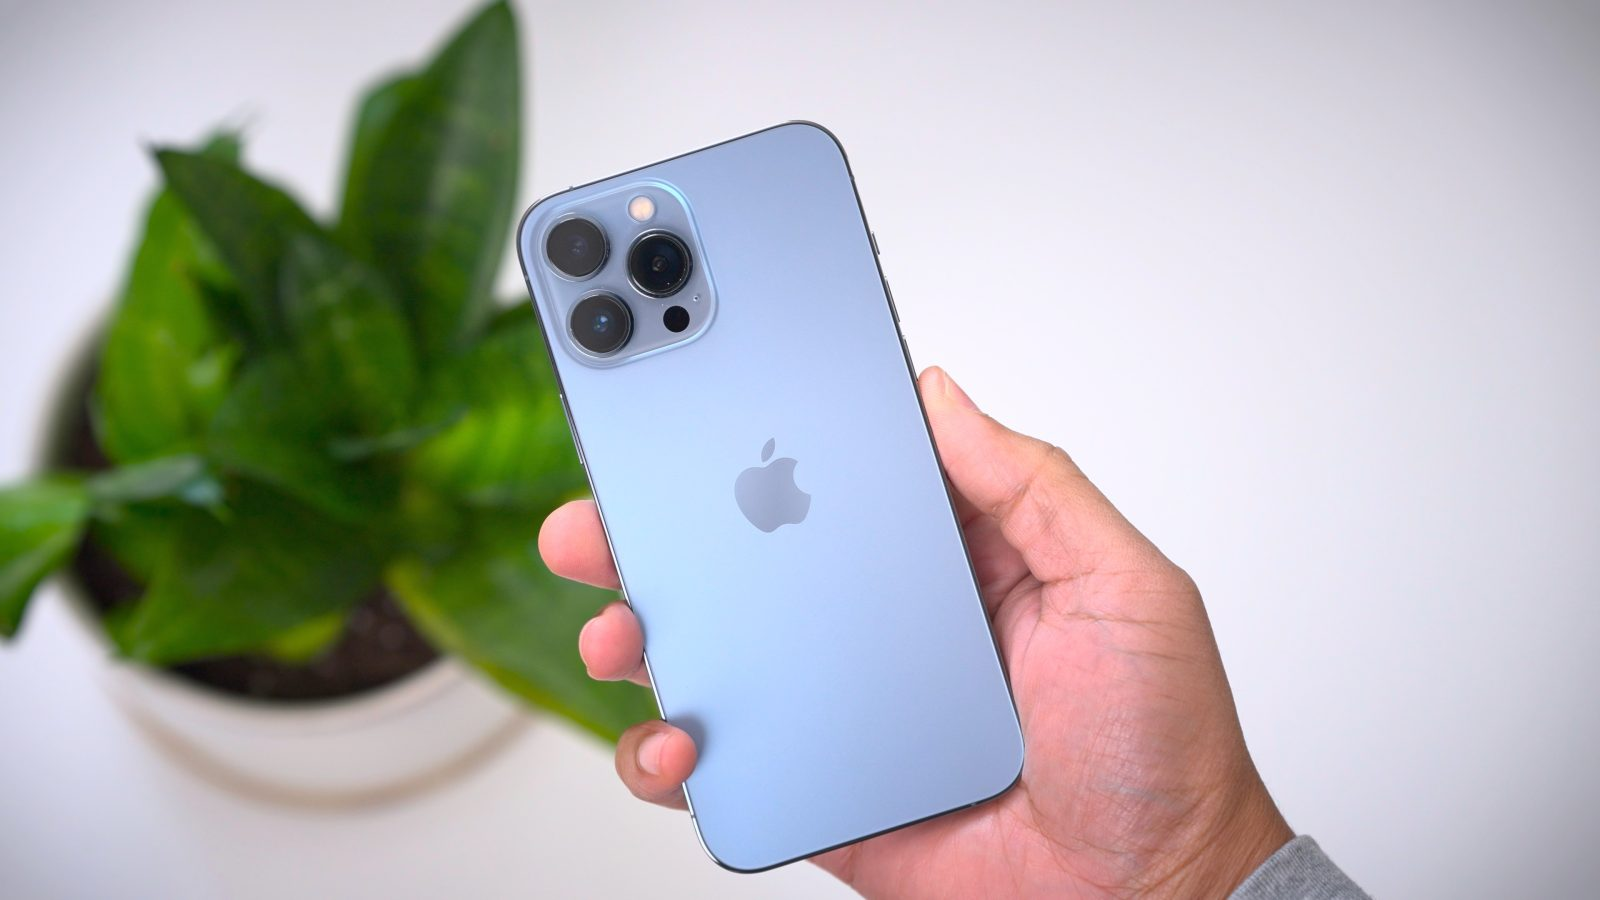 Apple execs praise iPhone 13 camera revolution in new interview